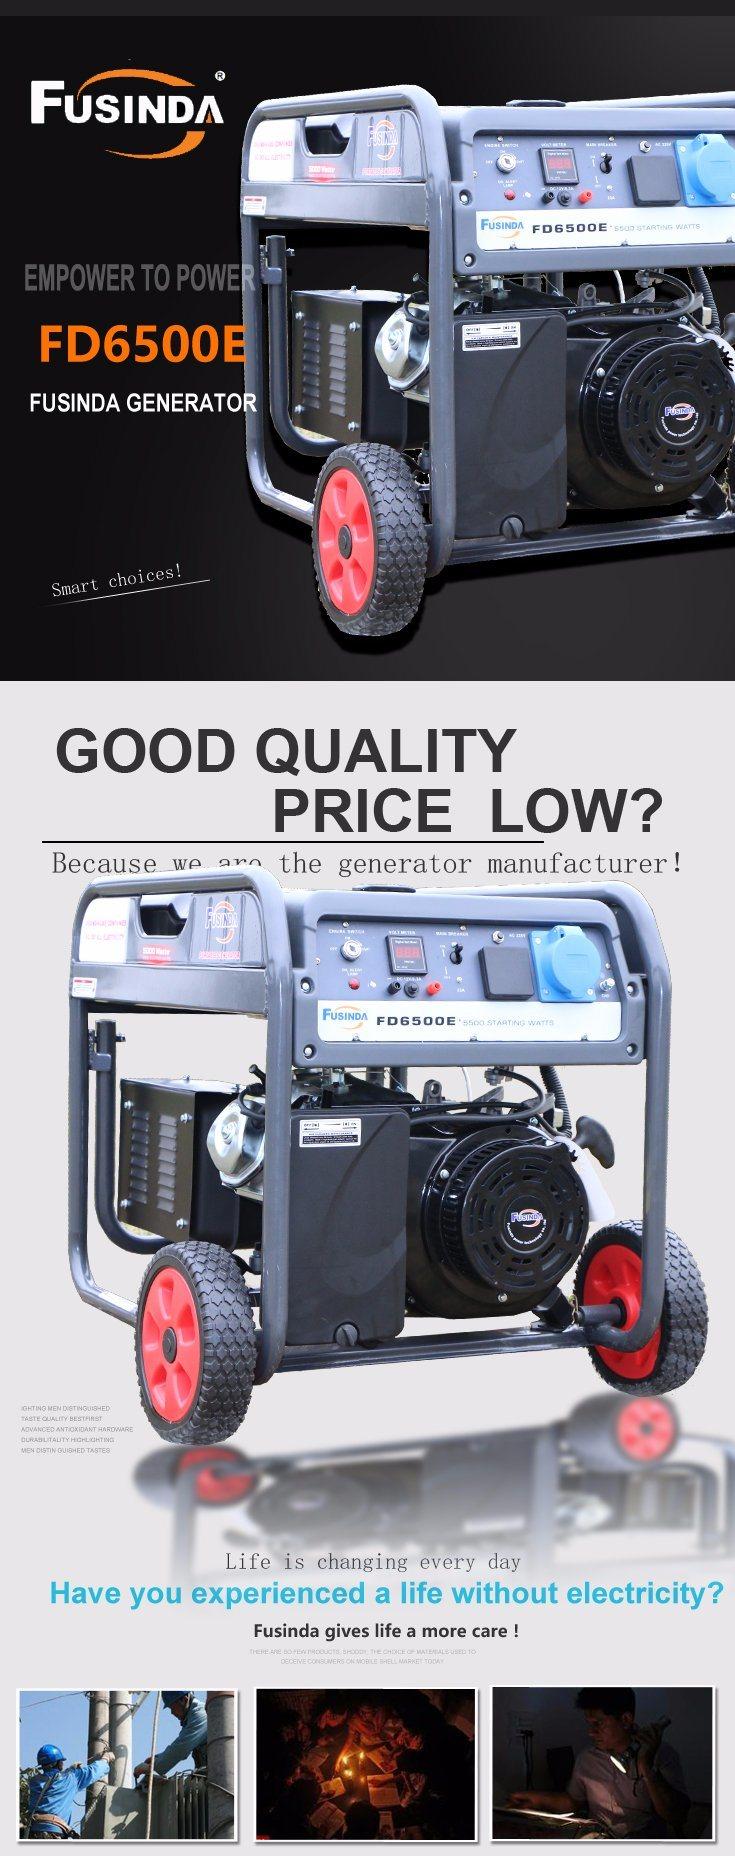 5kw Gasoline Generator Petrol Fd6500e